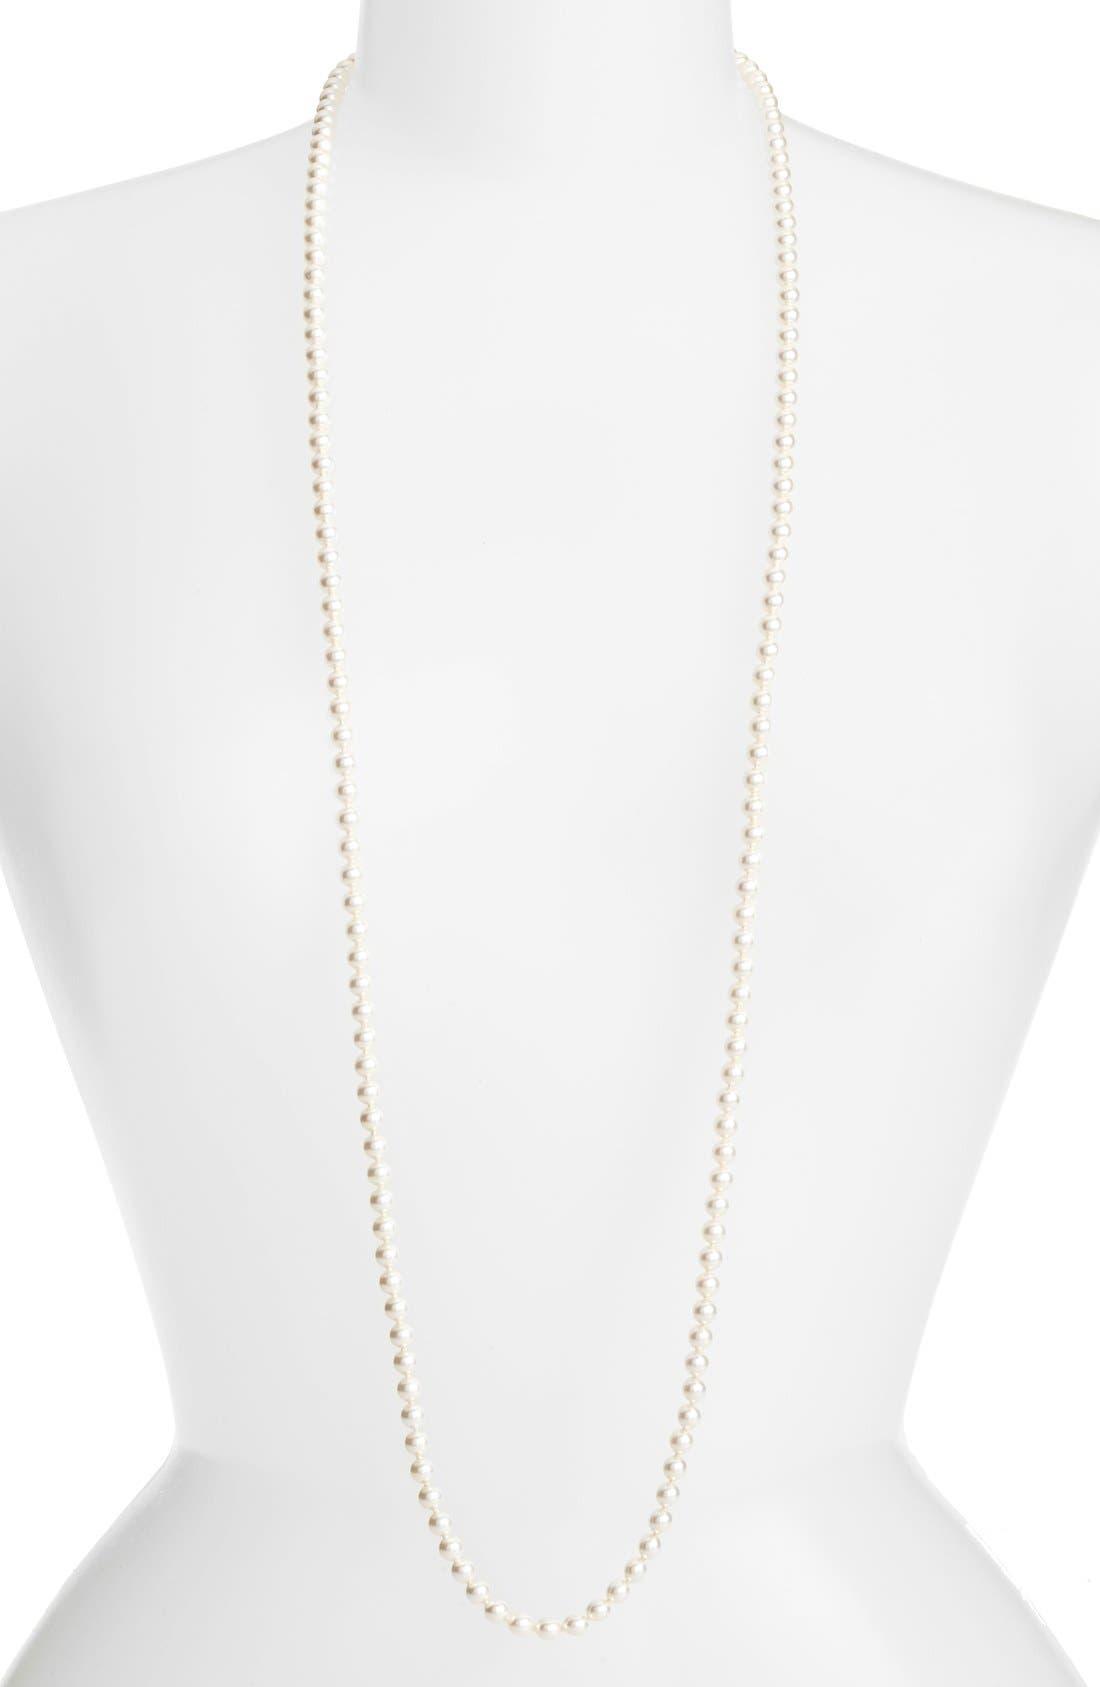 Imitation Pearl Strand Necklace,                             Main thumbnail 1, color,                             IVORY